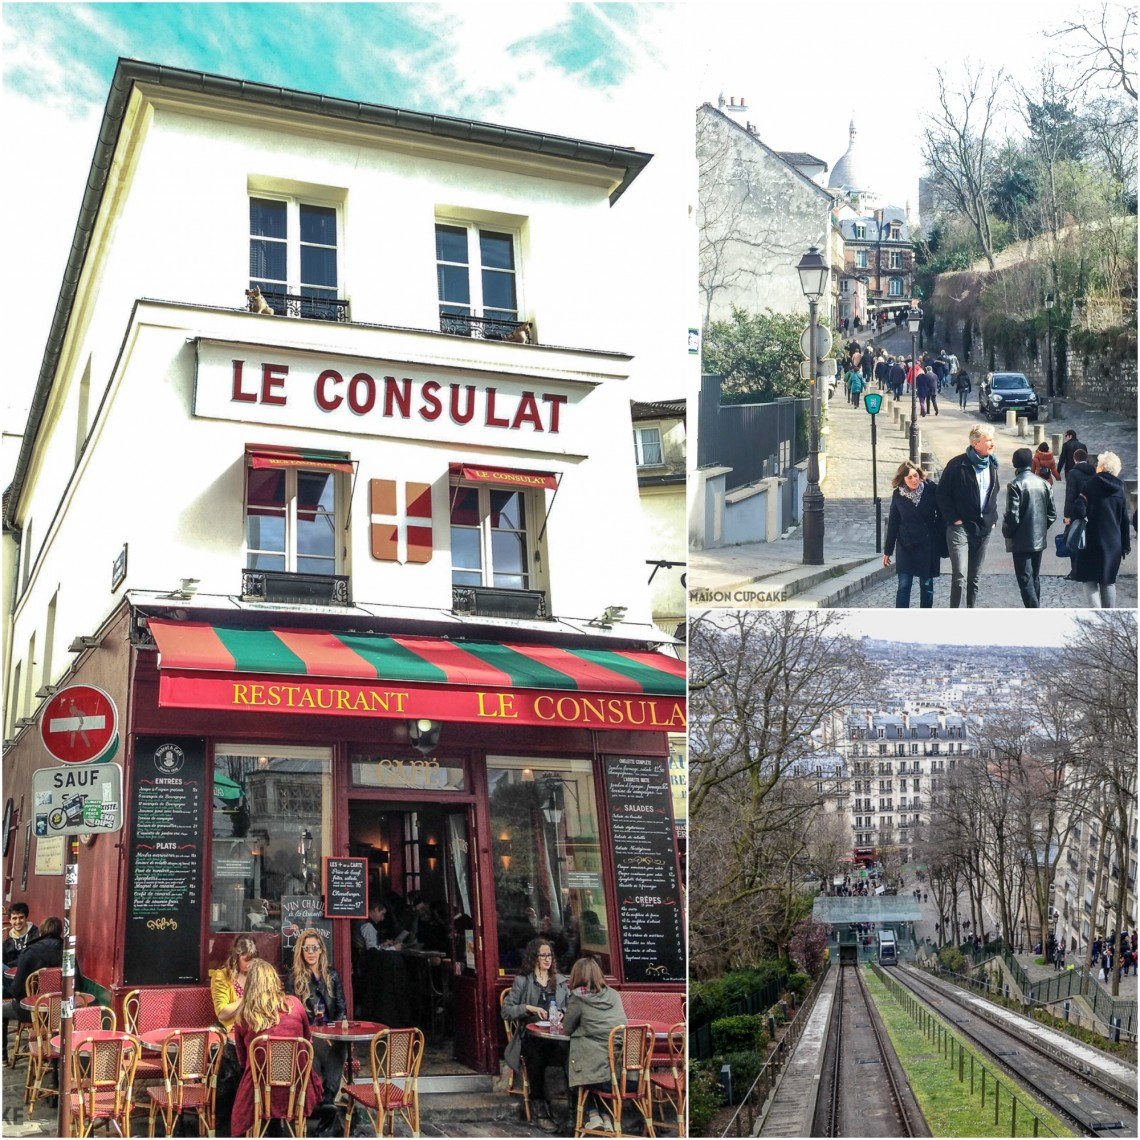 Walking through Montmartre Paris